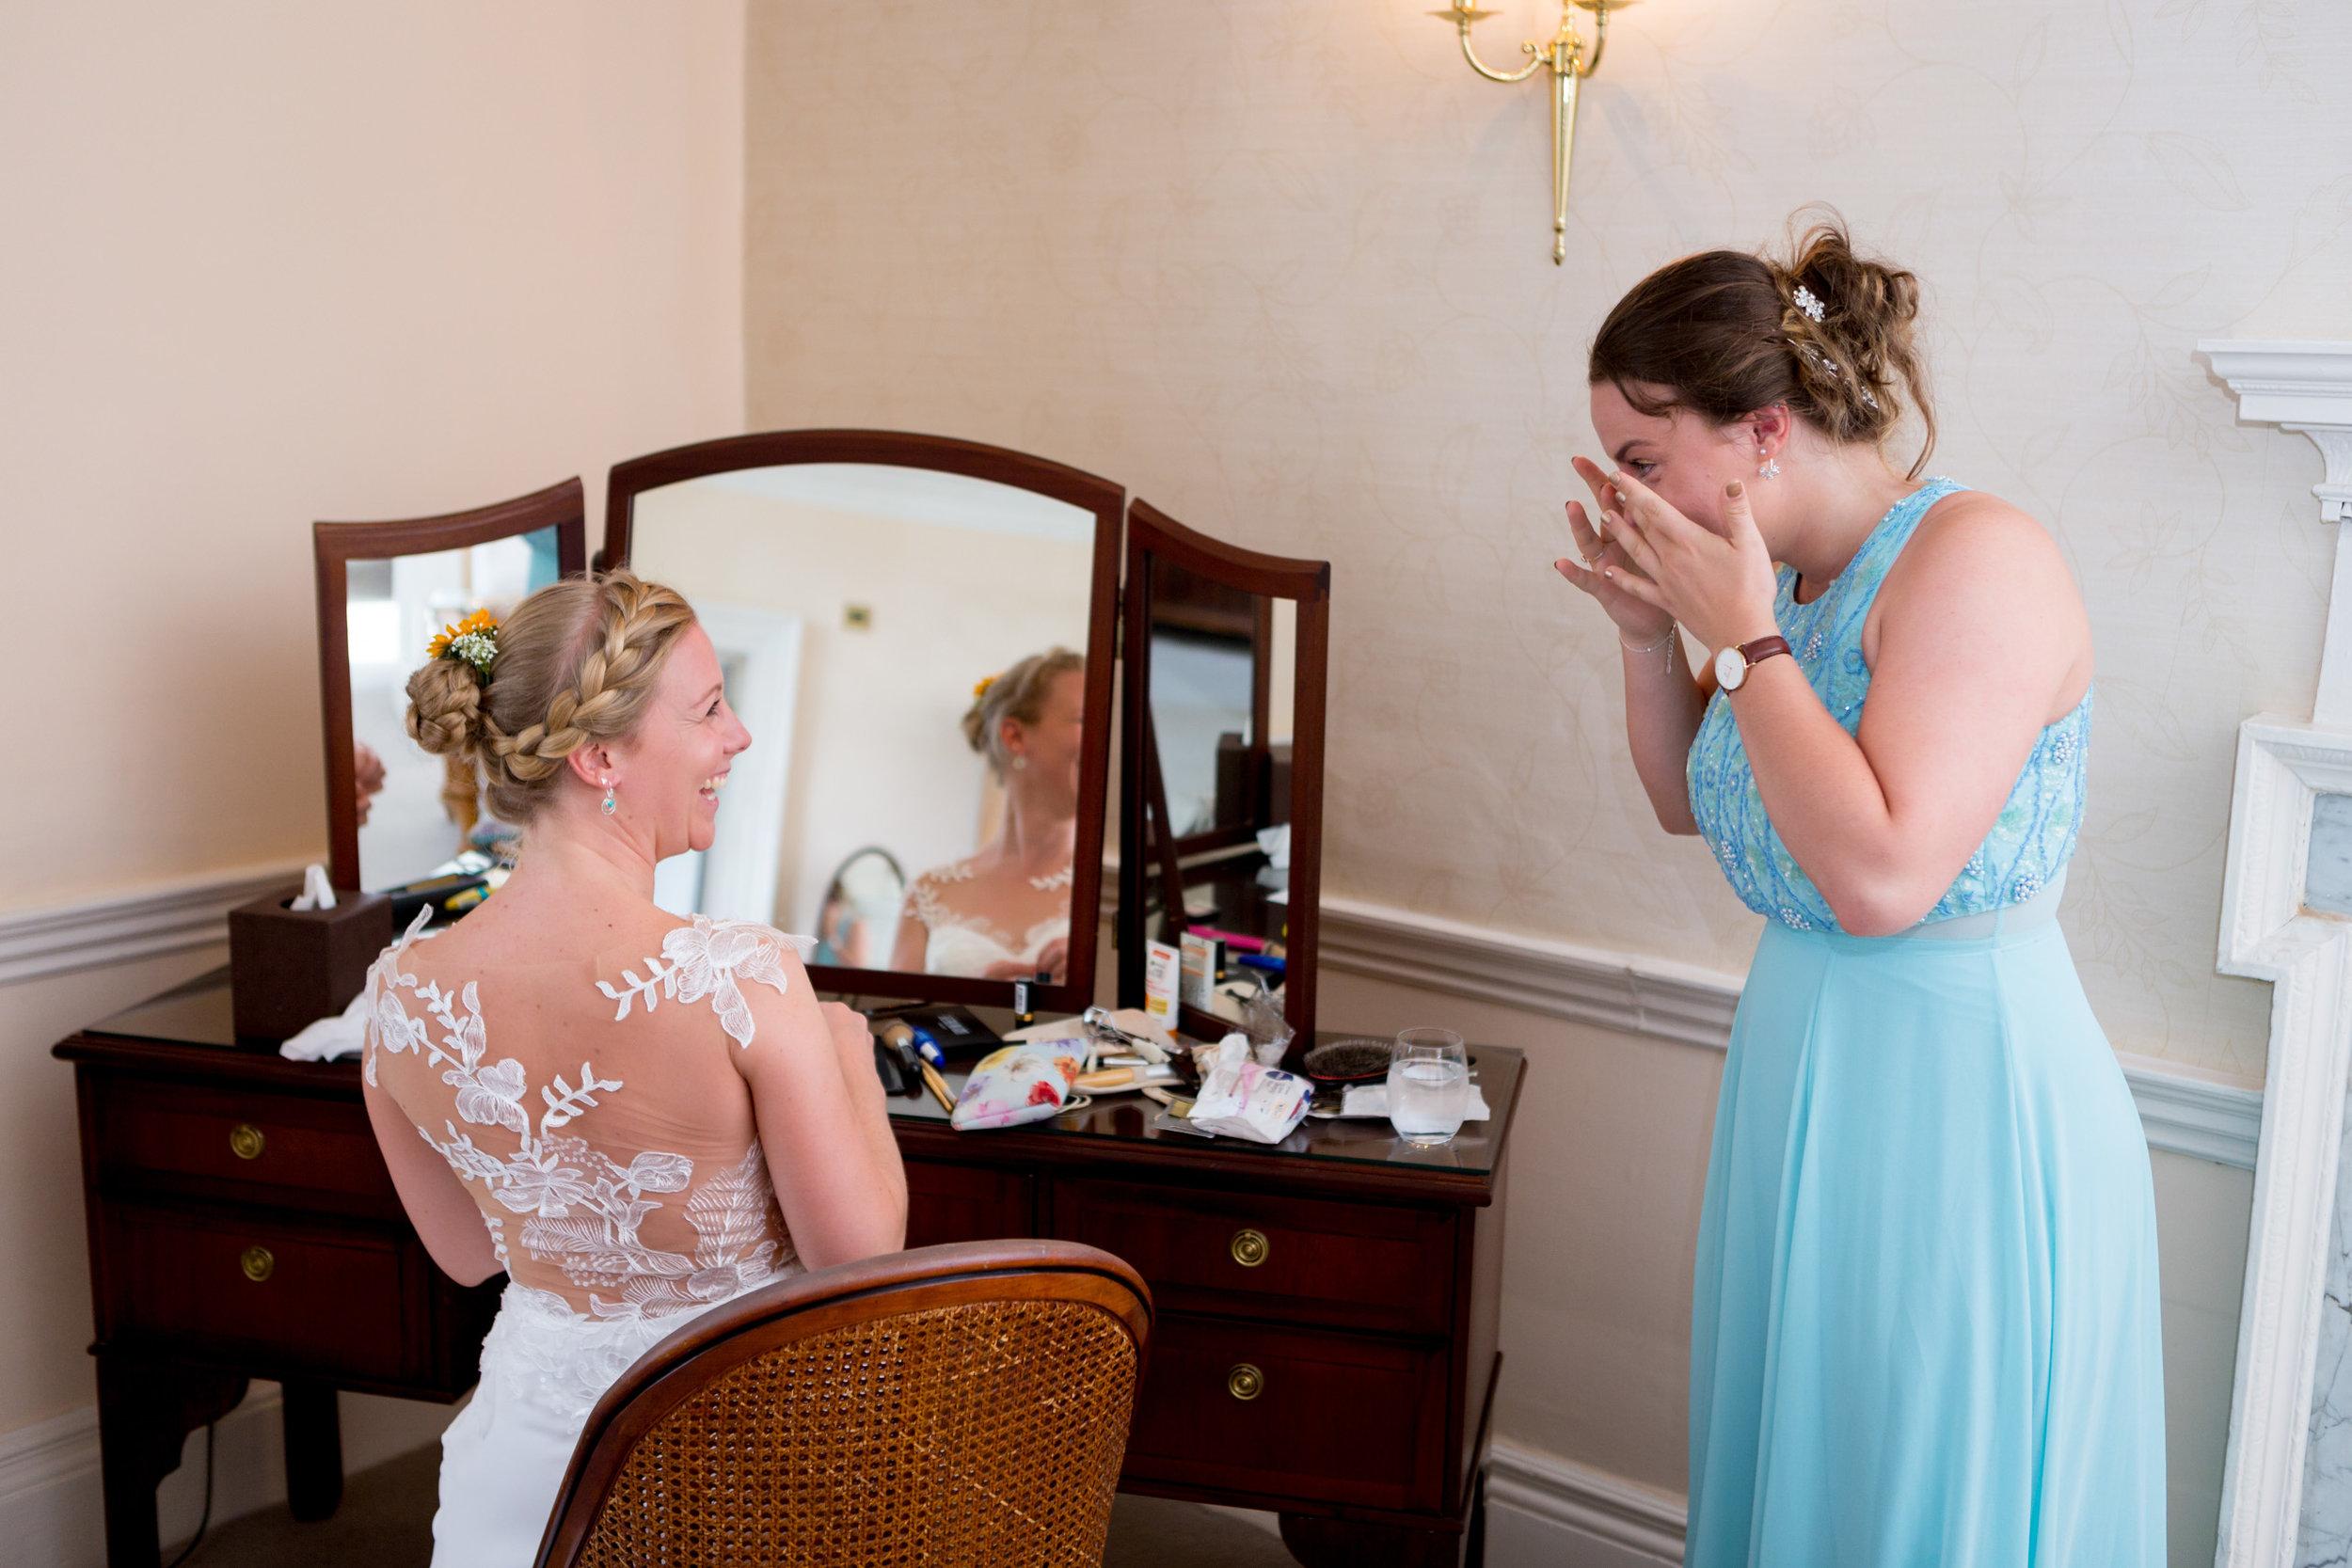 Bucklands-Tout-Saints-Hotel-Devon-Wedding-Photography-8.jpg